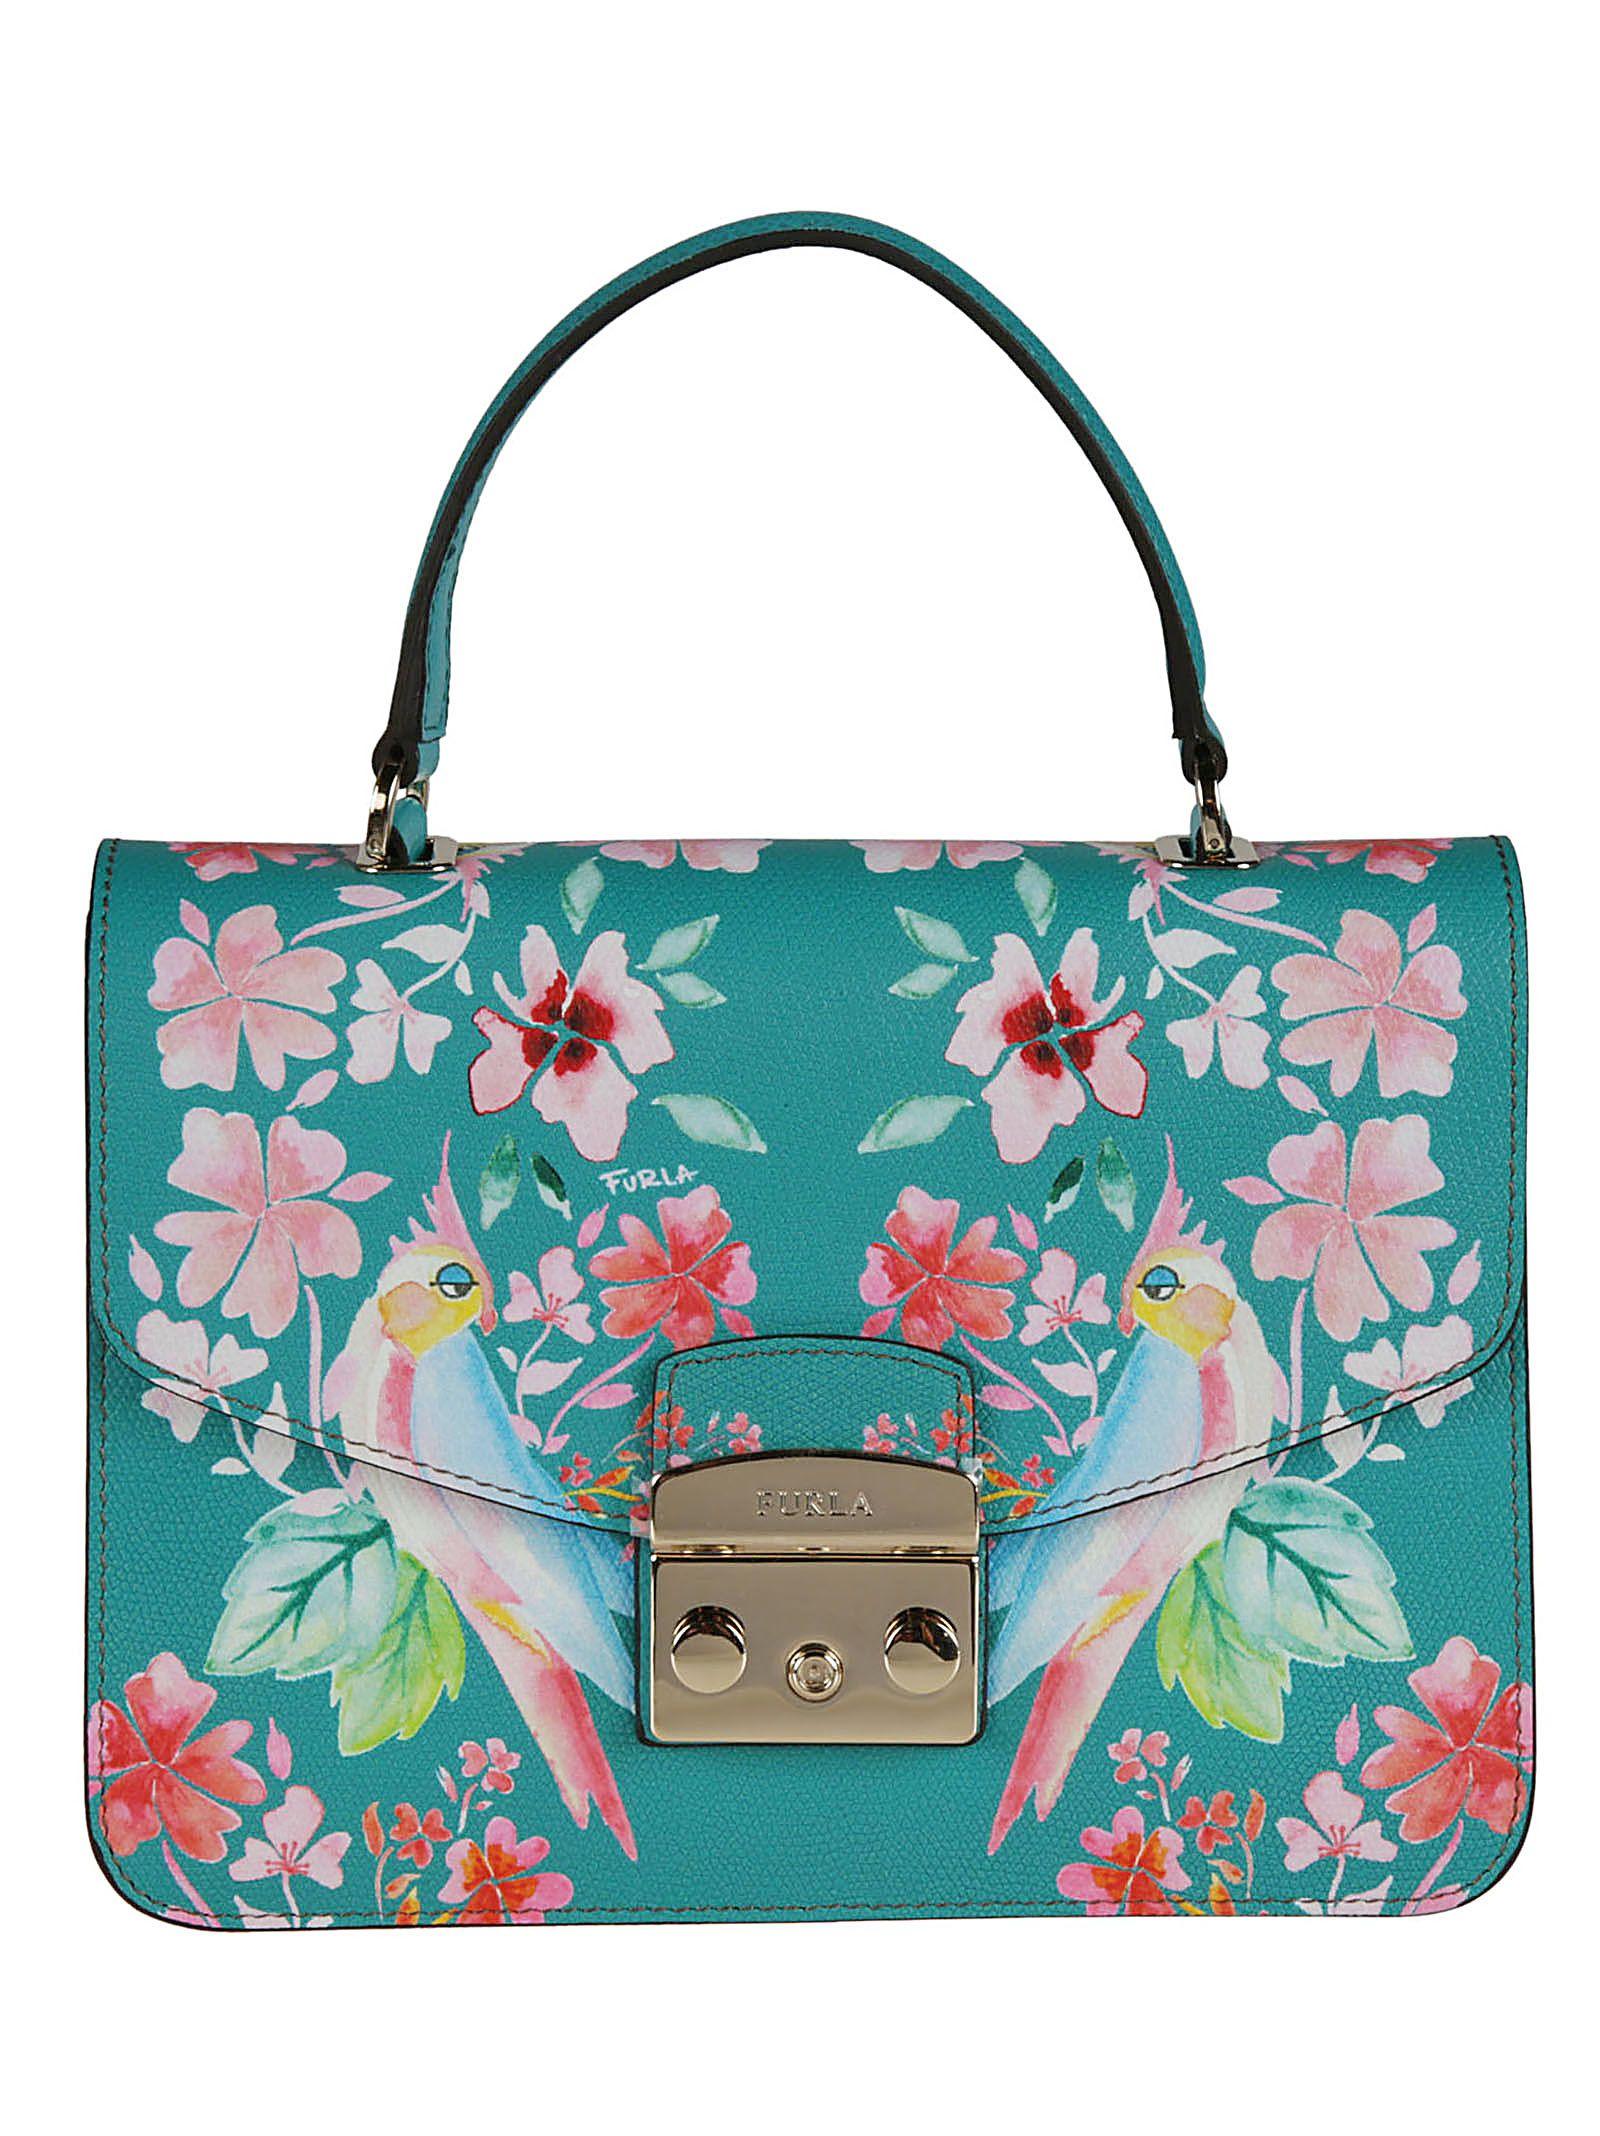 Furla Metropolis Bird Floral Shoulder Bag